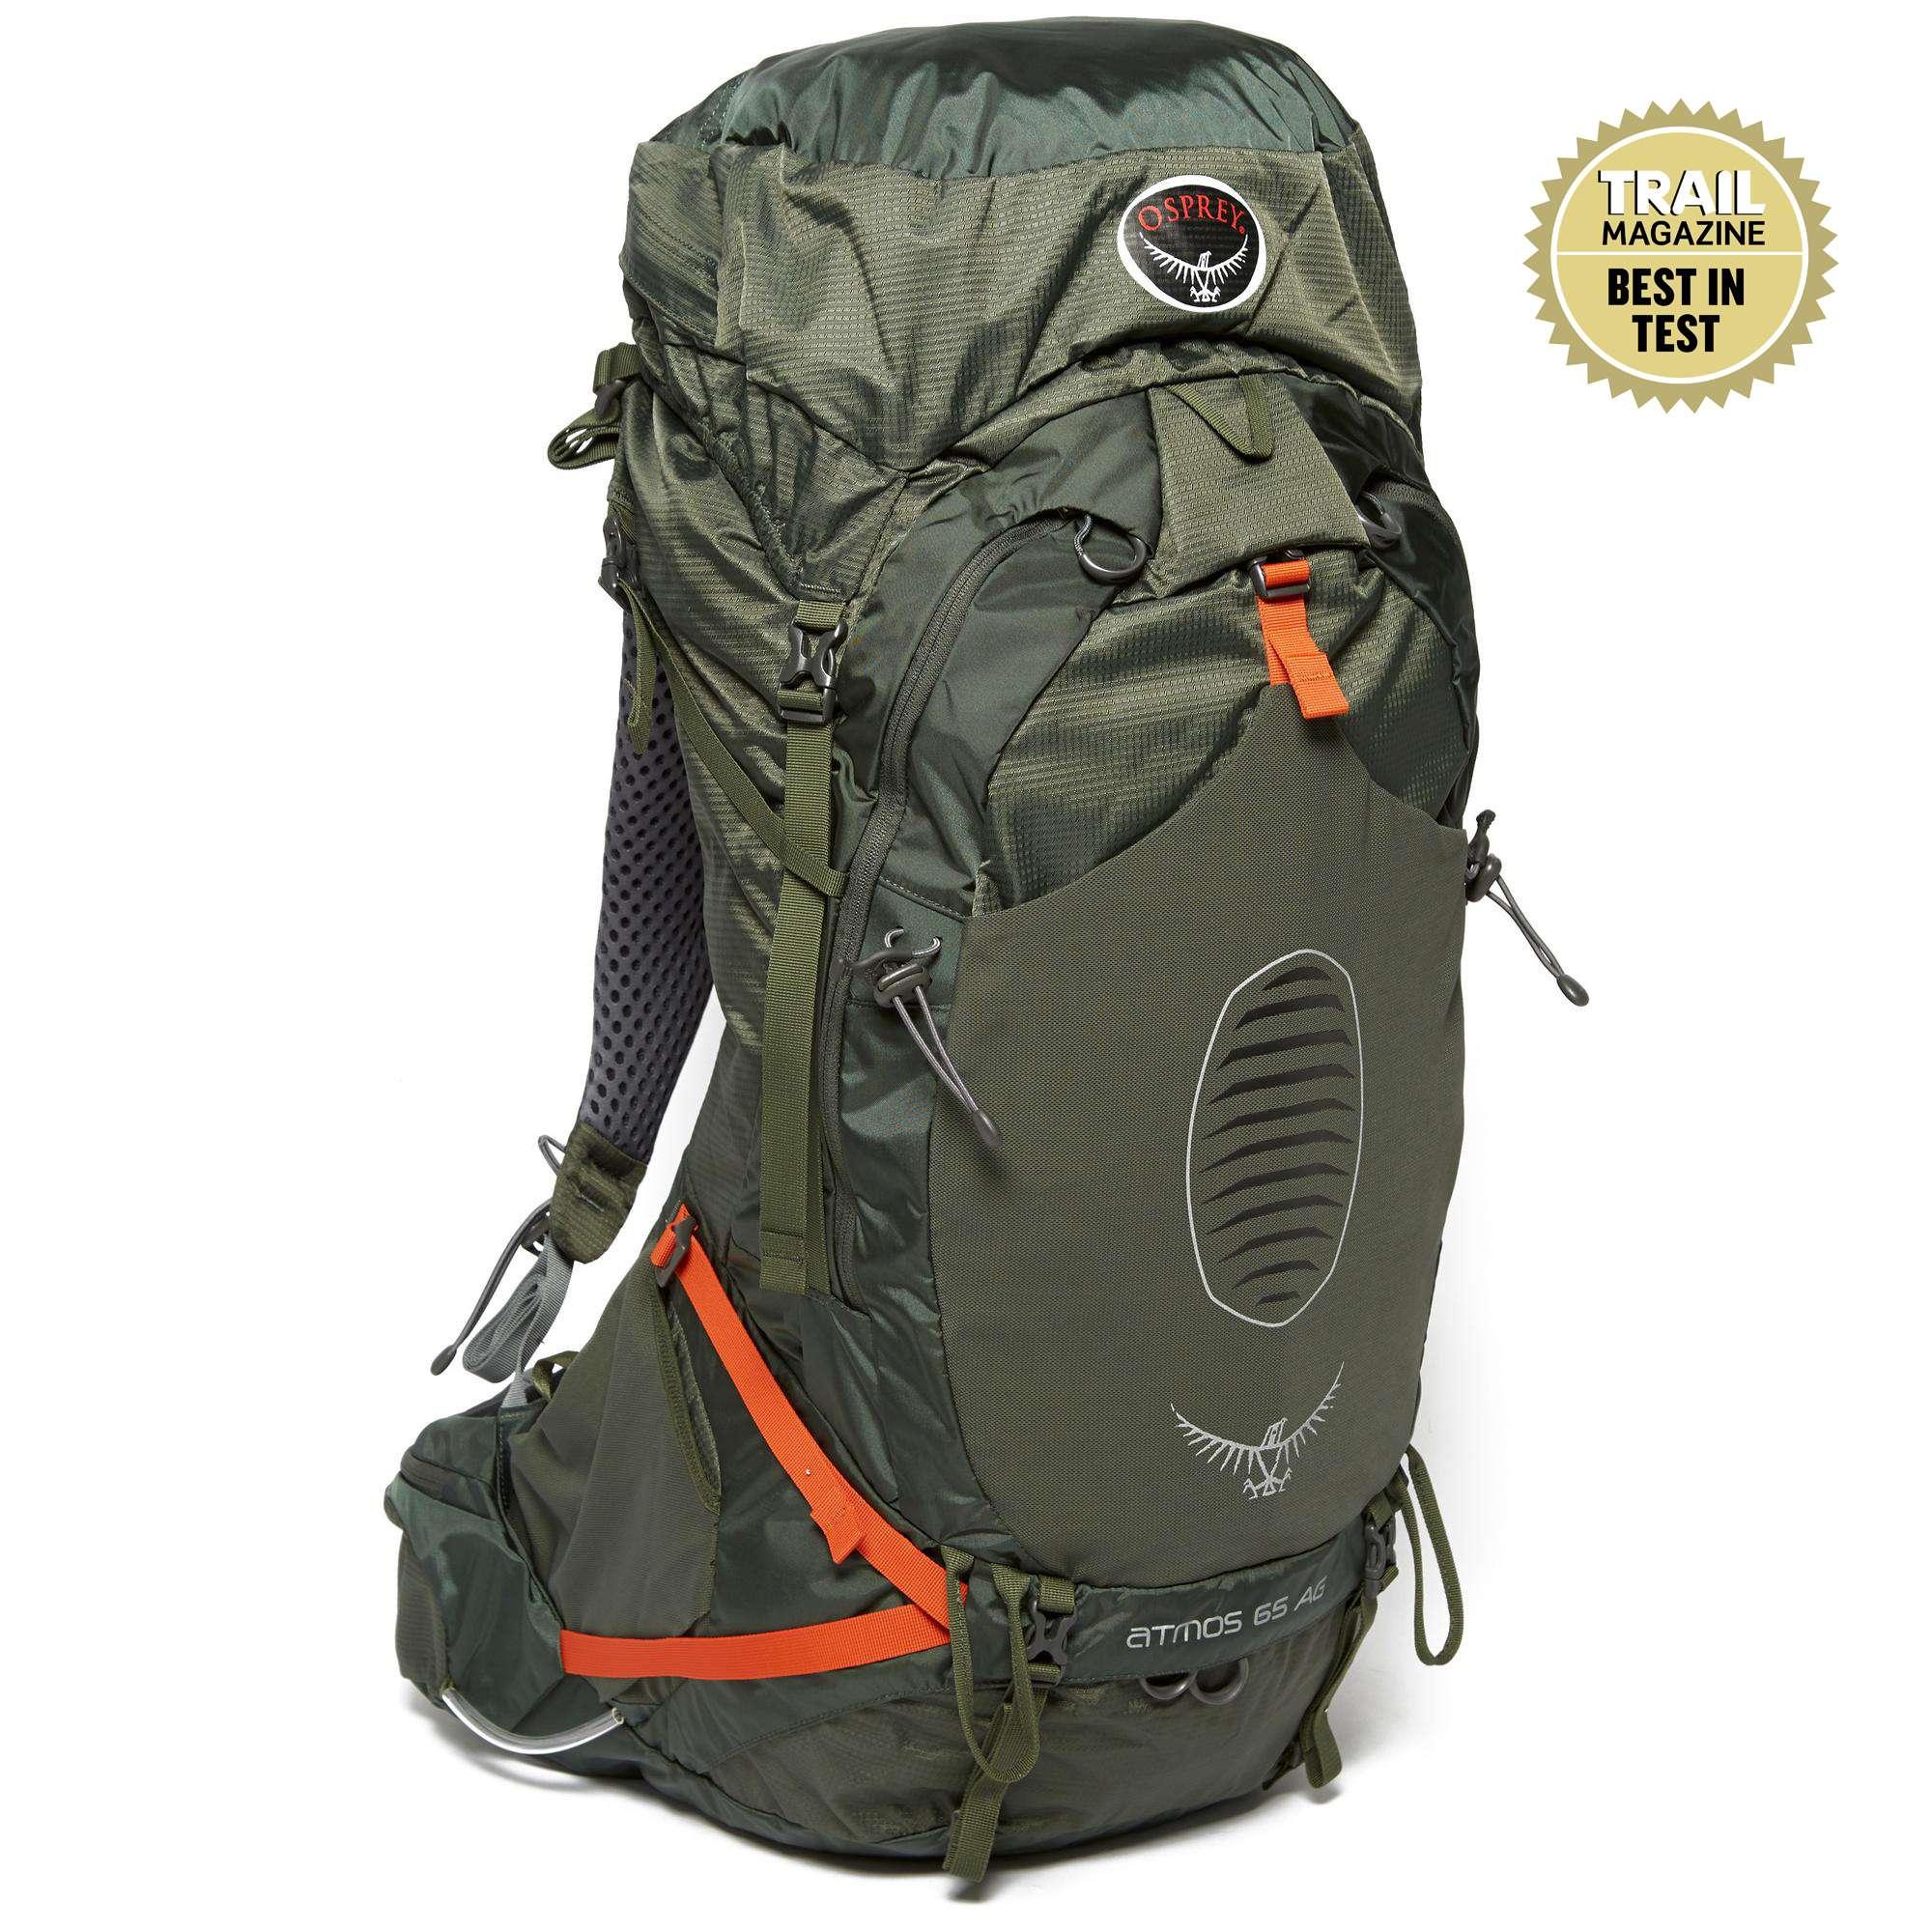 OSPREY Atmos AG 65 Backpack (Medium)